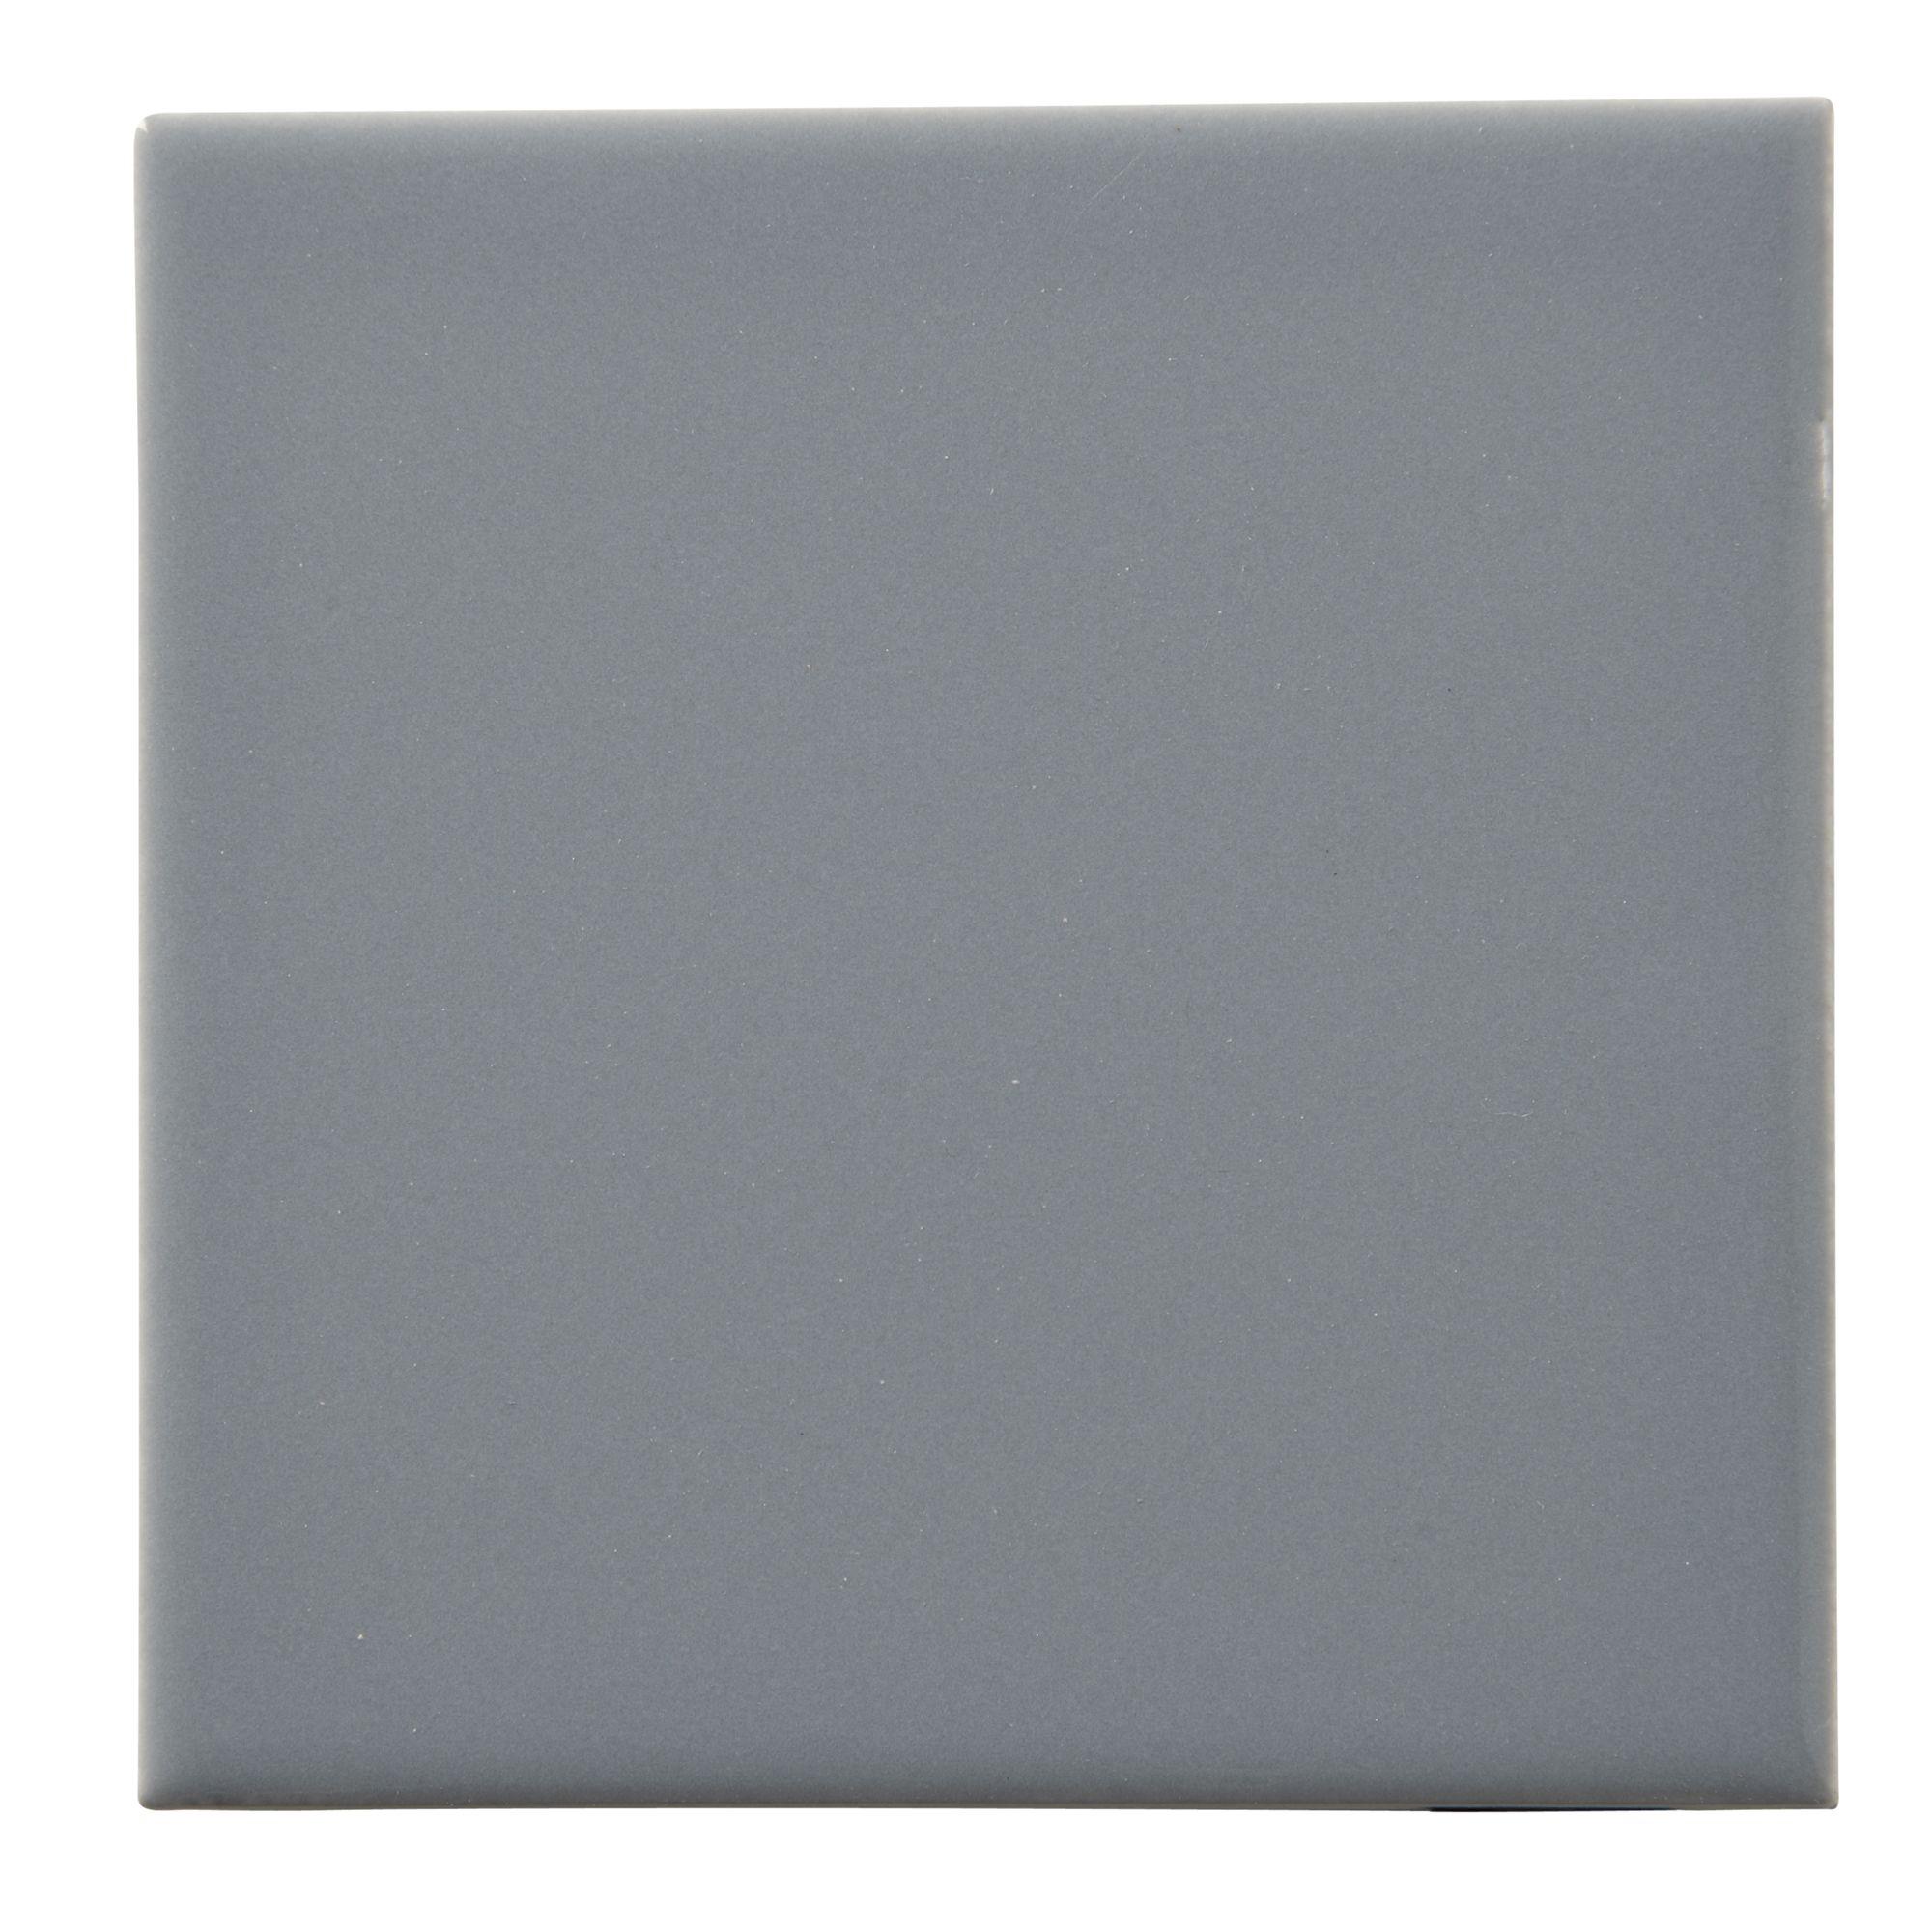 Utopia grey ceramic wall tile pack of 44 l150mm w150mm utopia grey ceramic wall tile pack of 44 l150mm w150mm departments diy at bq dailygadgetfo Gallery